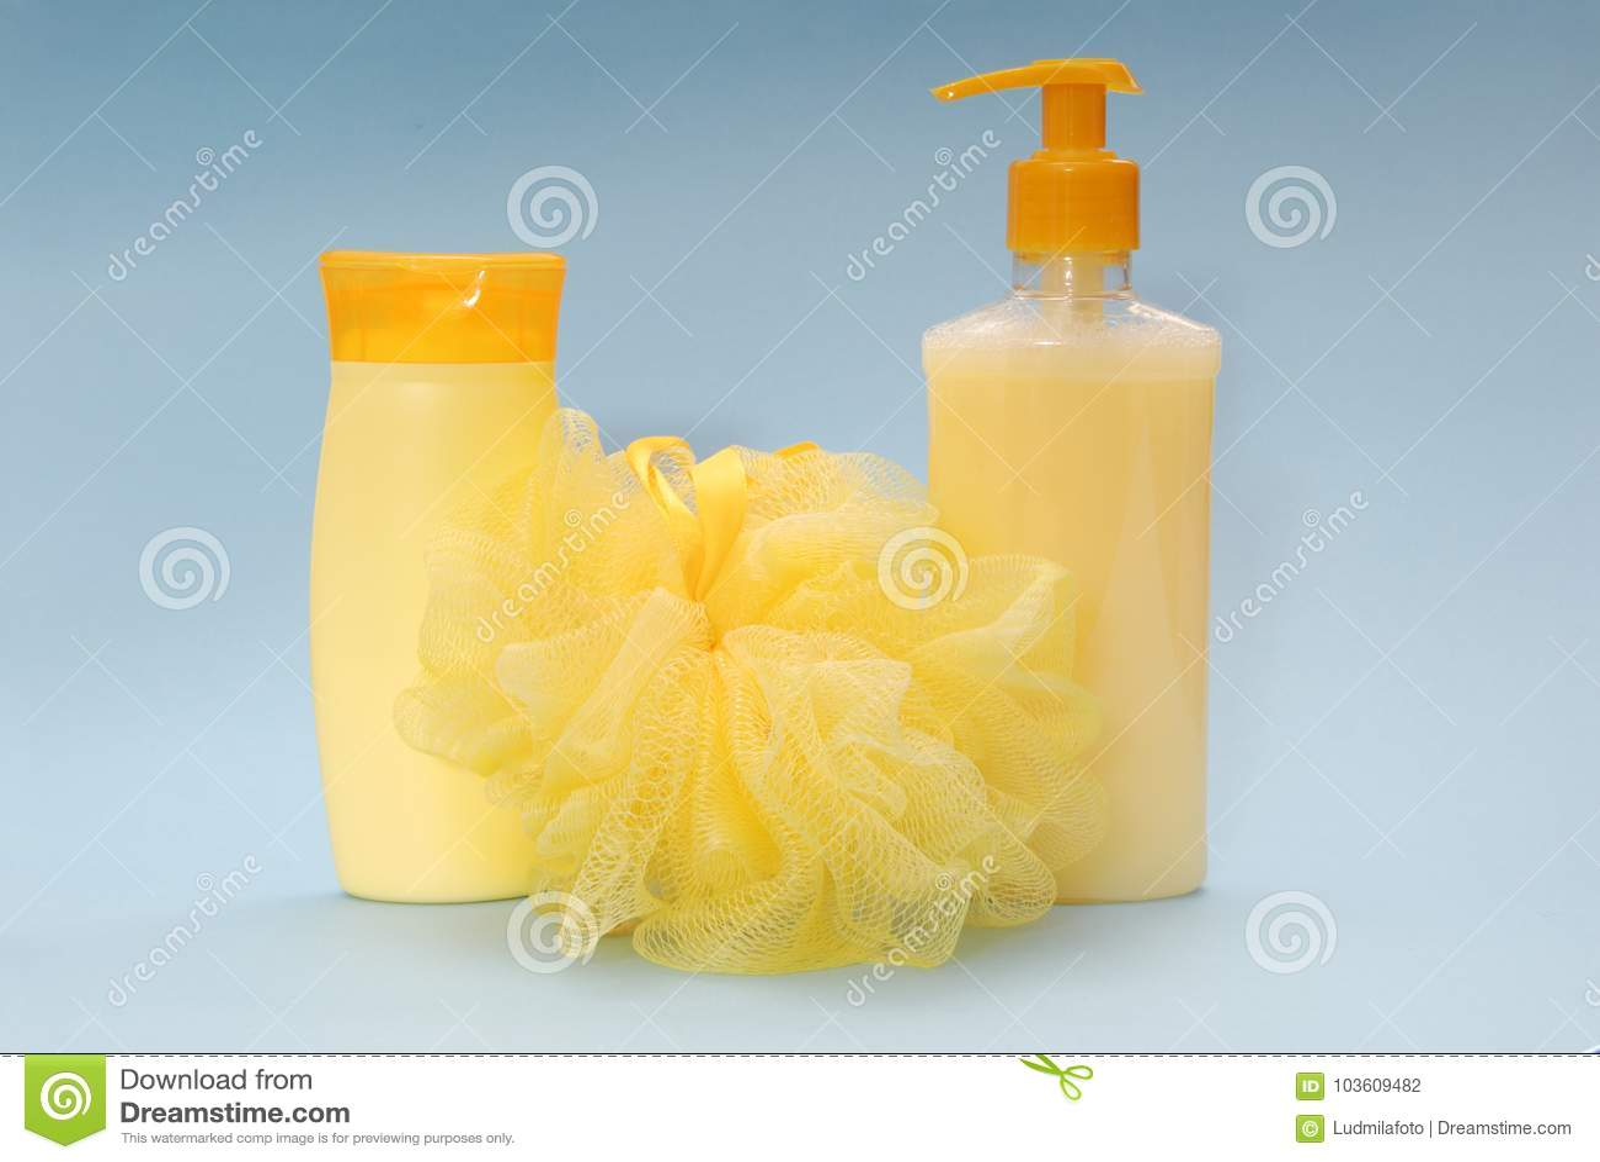 Bast whisp, shampoo and shower gel